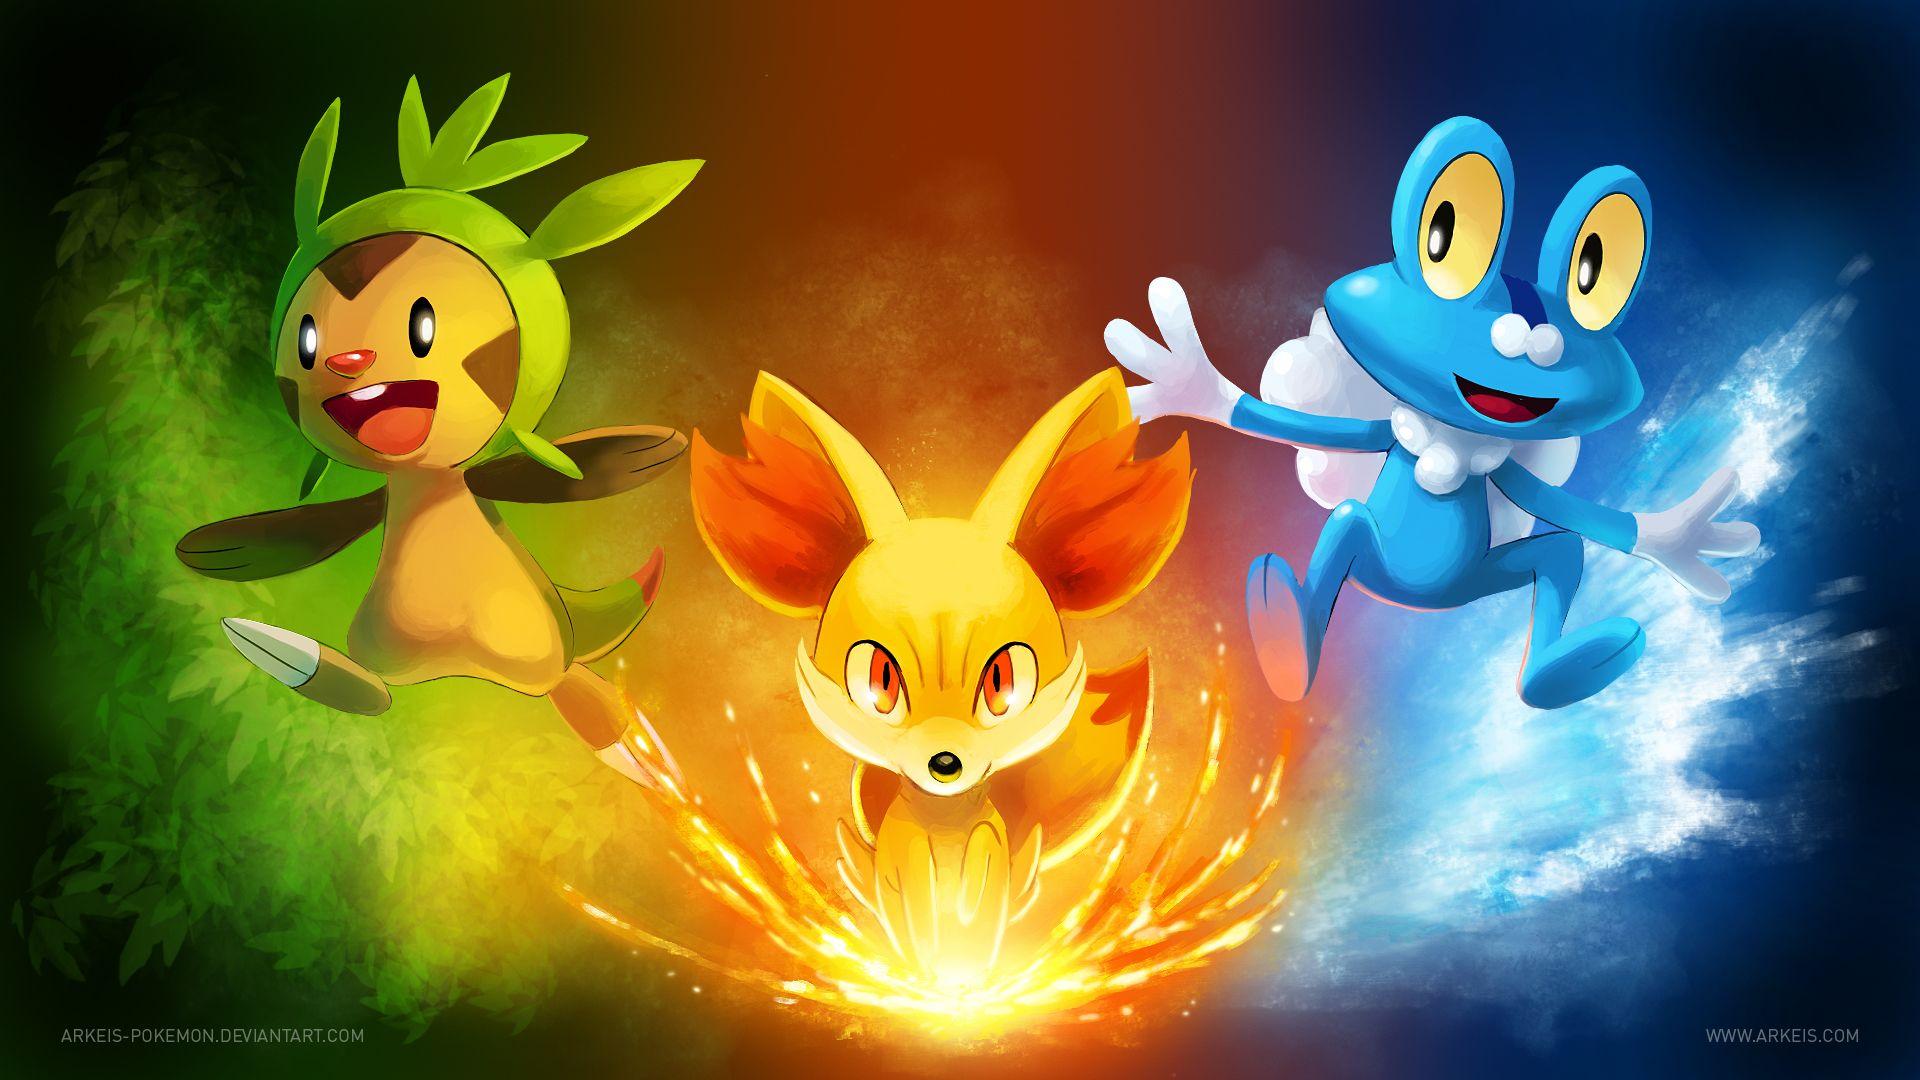 Pictures Of Pokemon